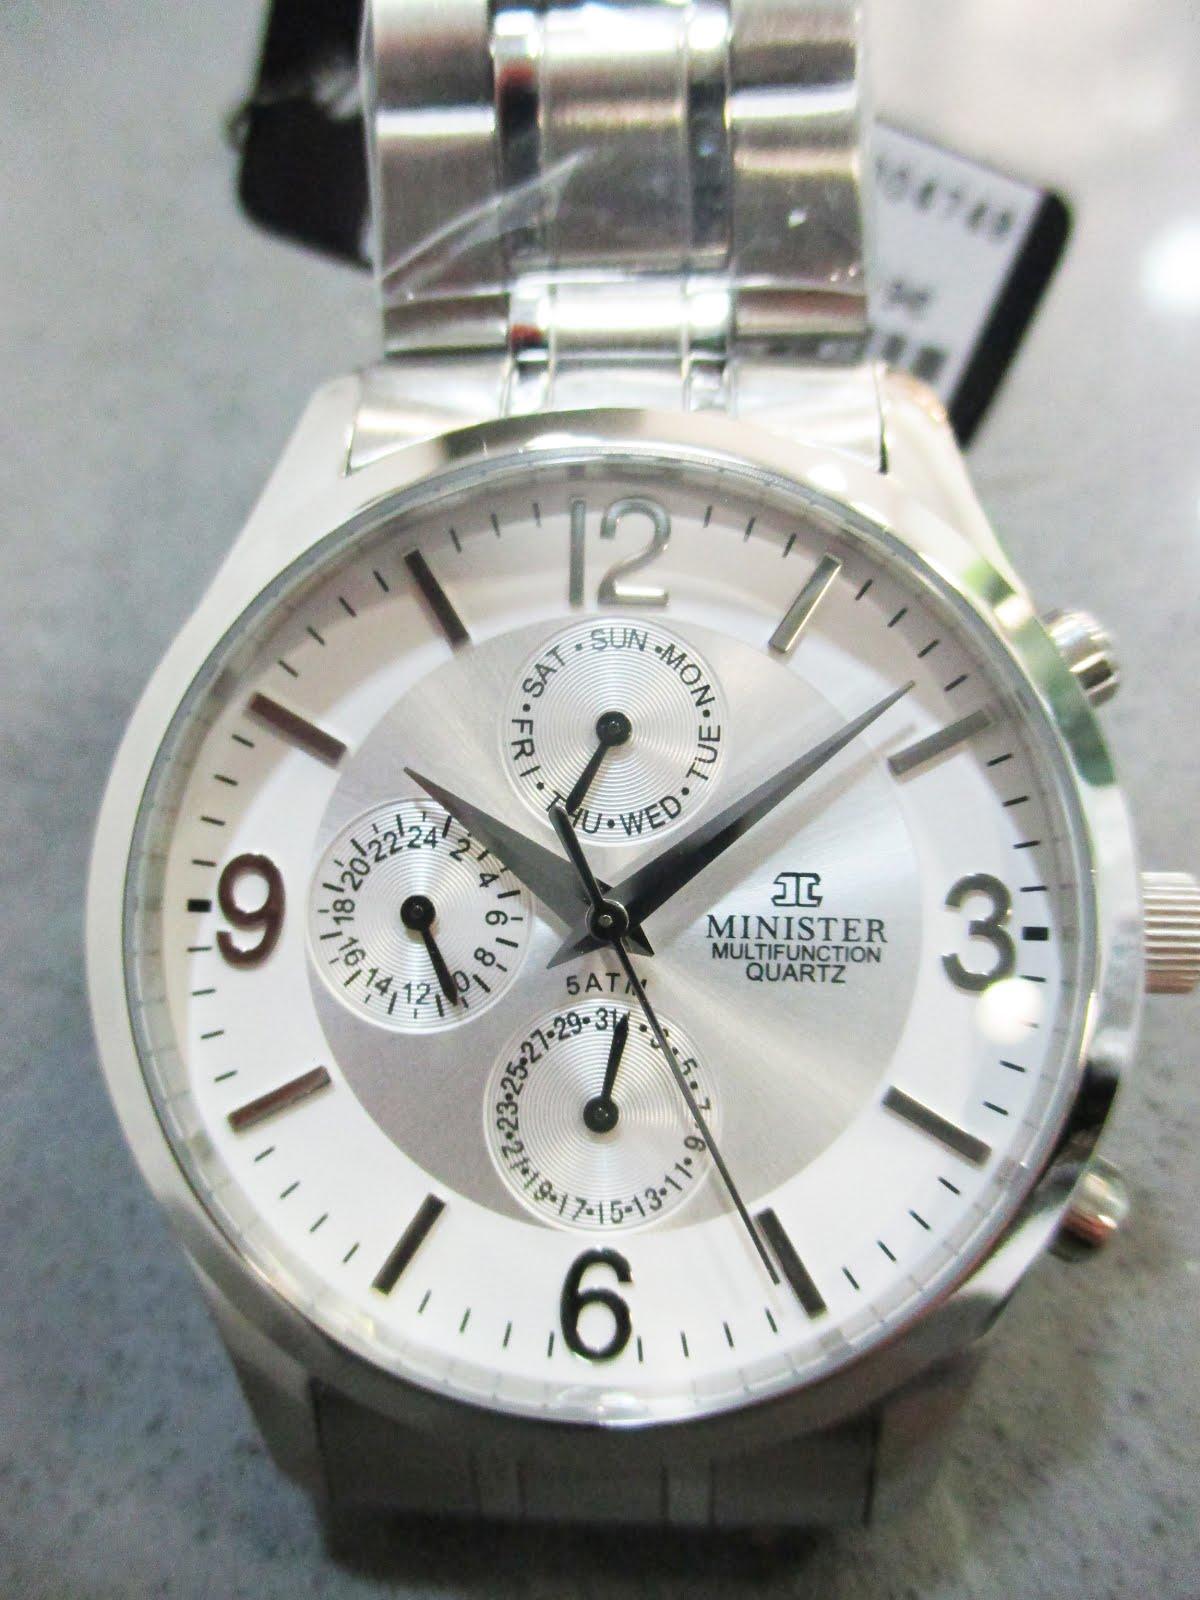 Reloj Minister acero caballero multifunción acuático